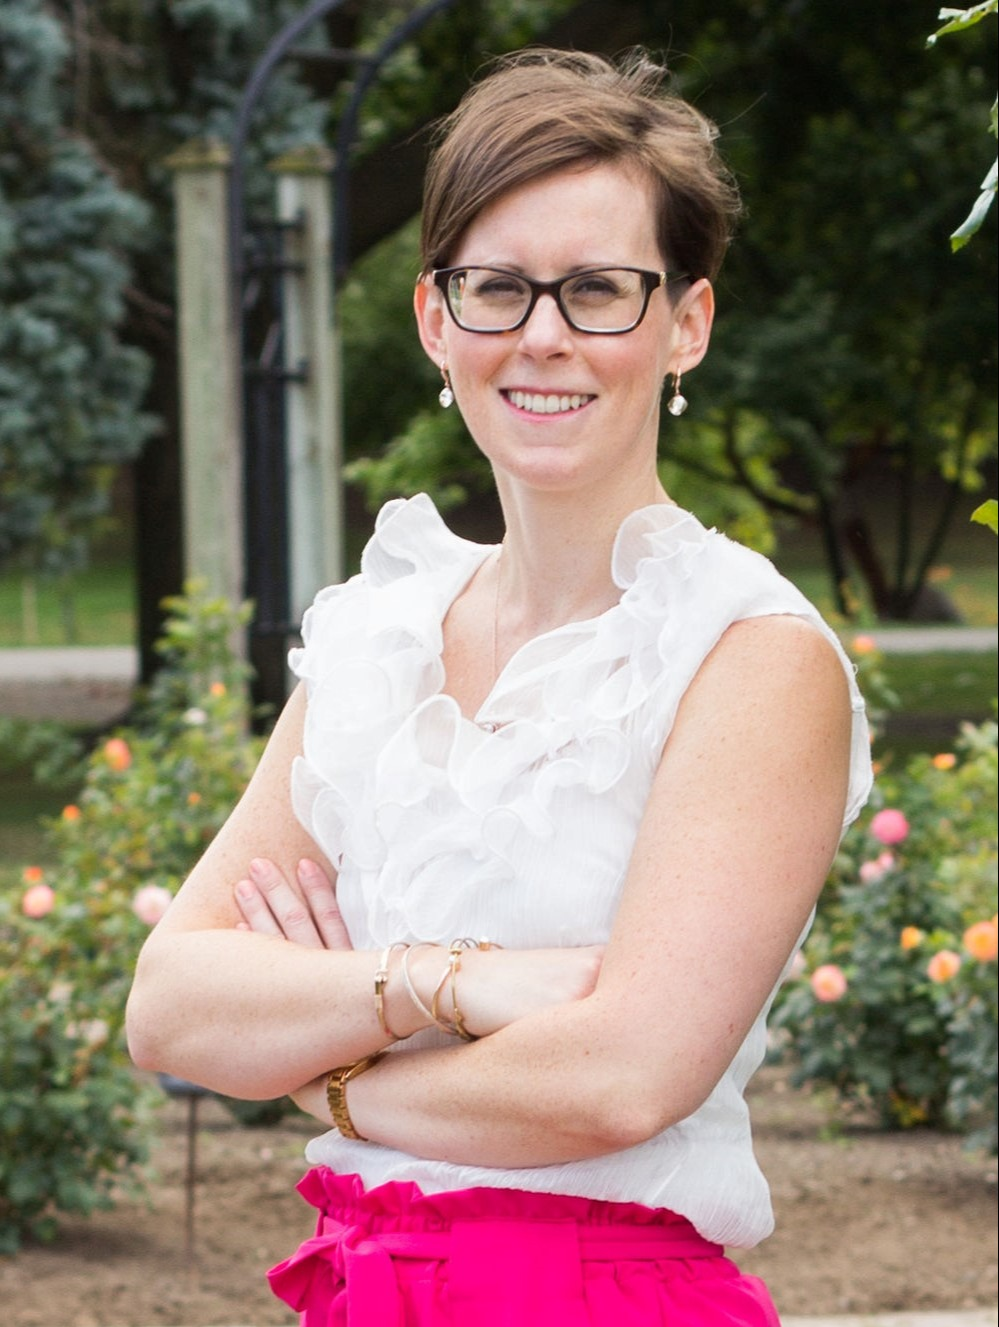 Sarah McKenzie is a SEO Website Copywriter from Toronto, ON.